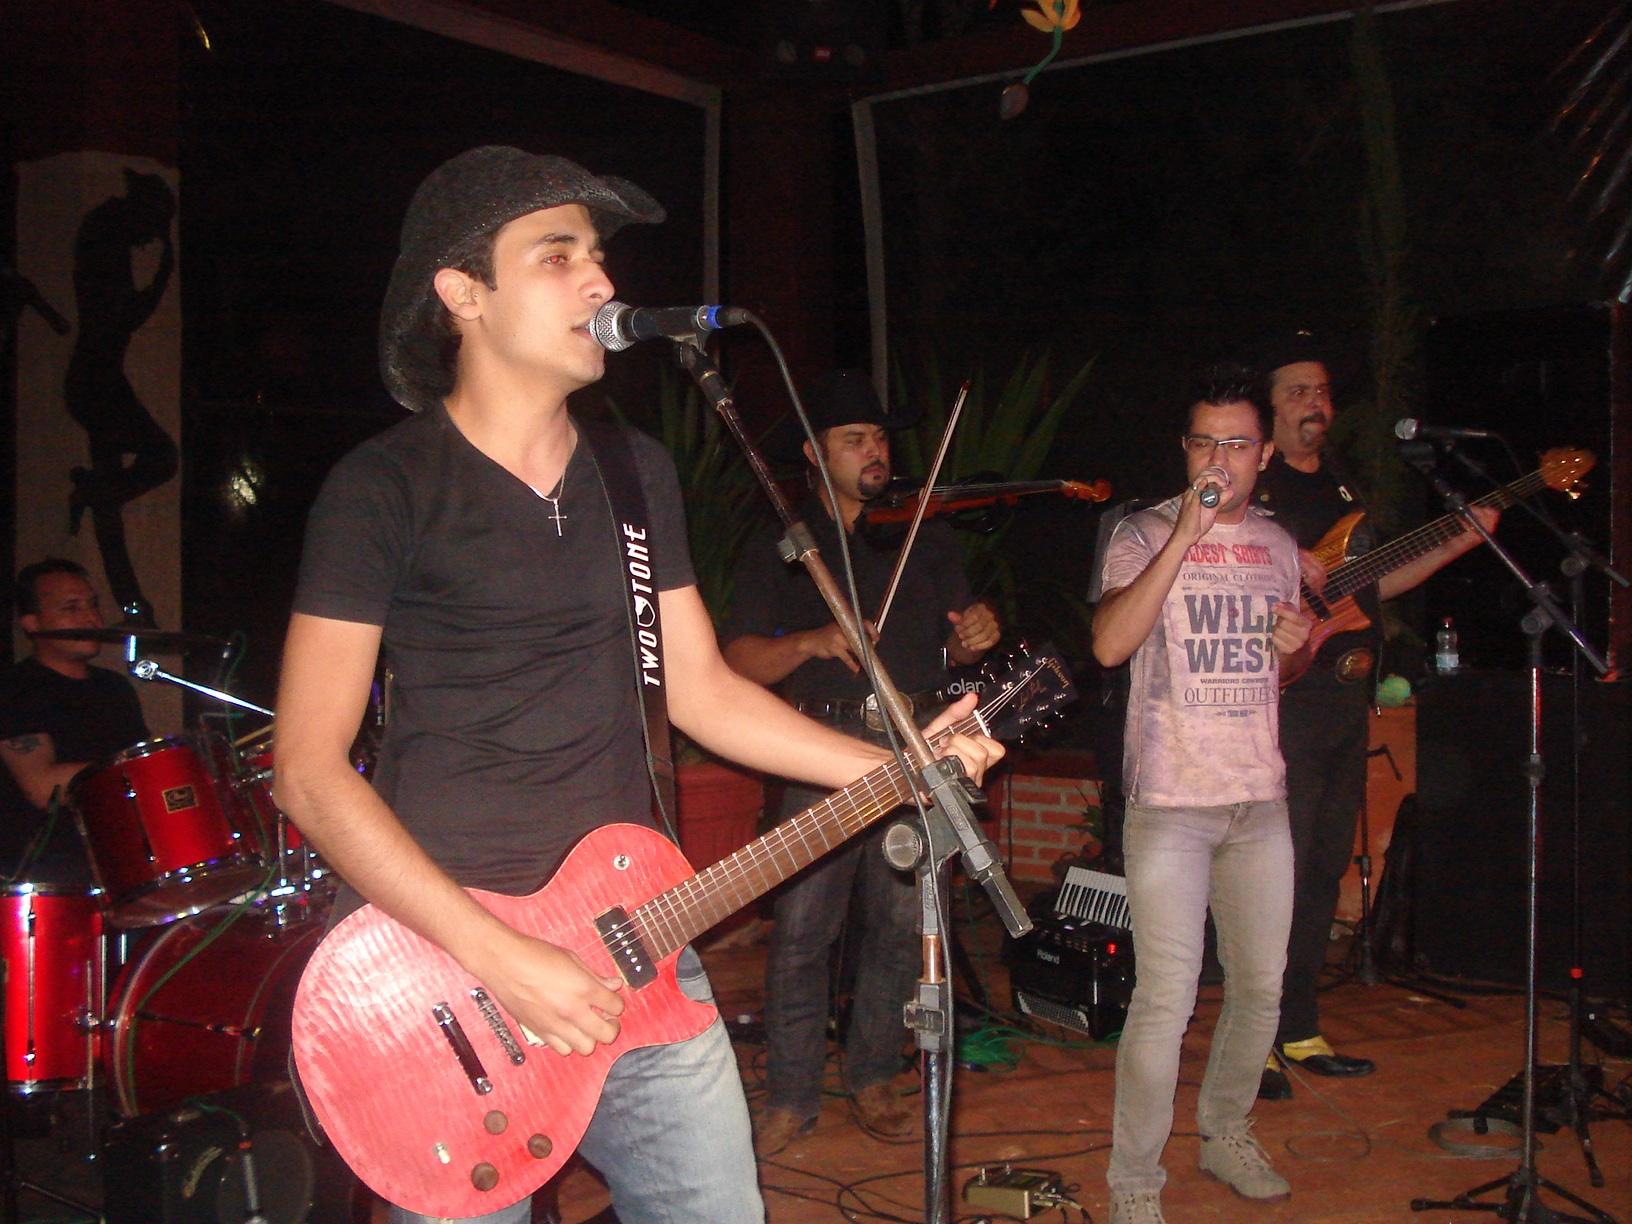 banda forró_sertanejo